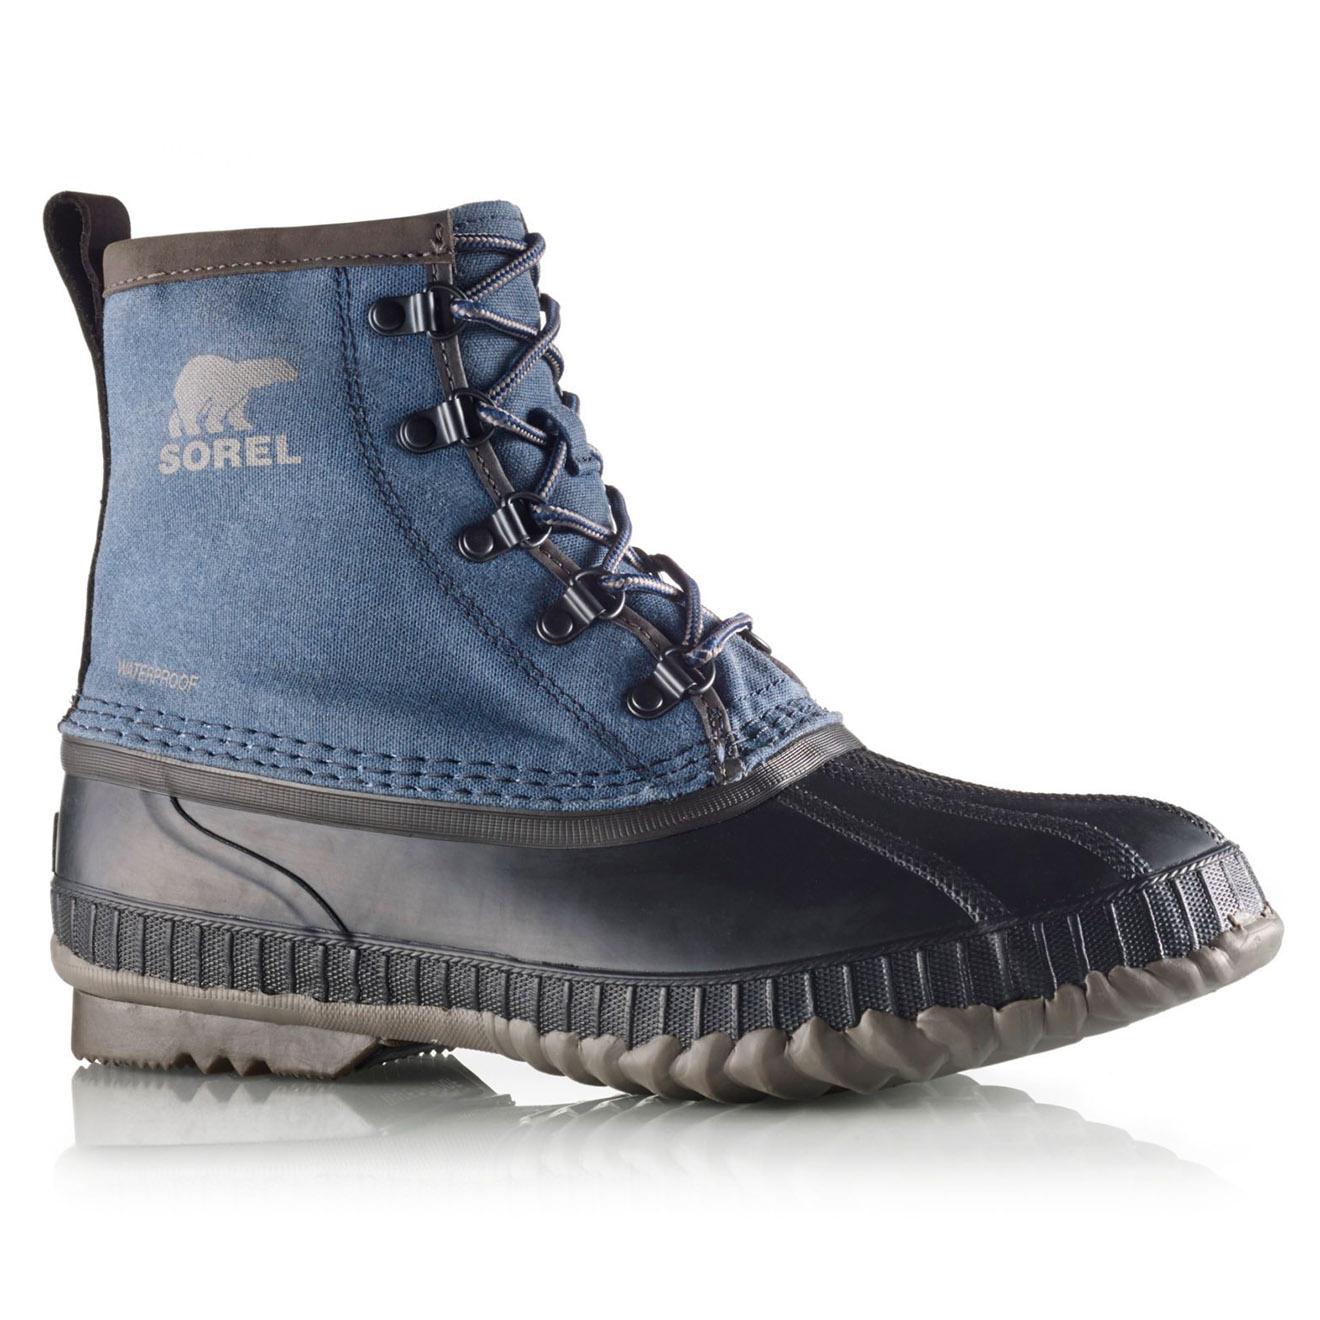 Boots de pluie imperméables Cheyanne II Short CVS bleu jean/noir - Sorel - Modalova